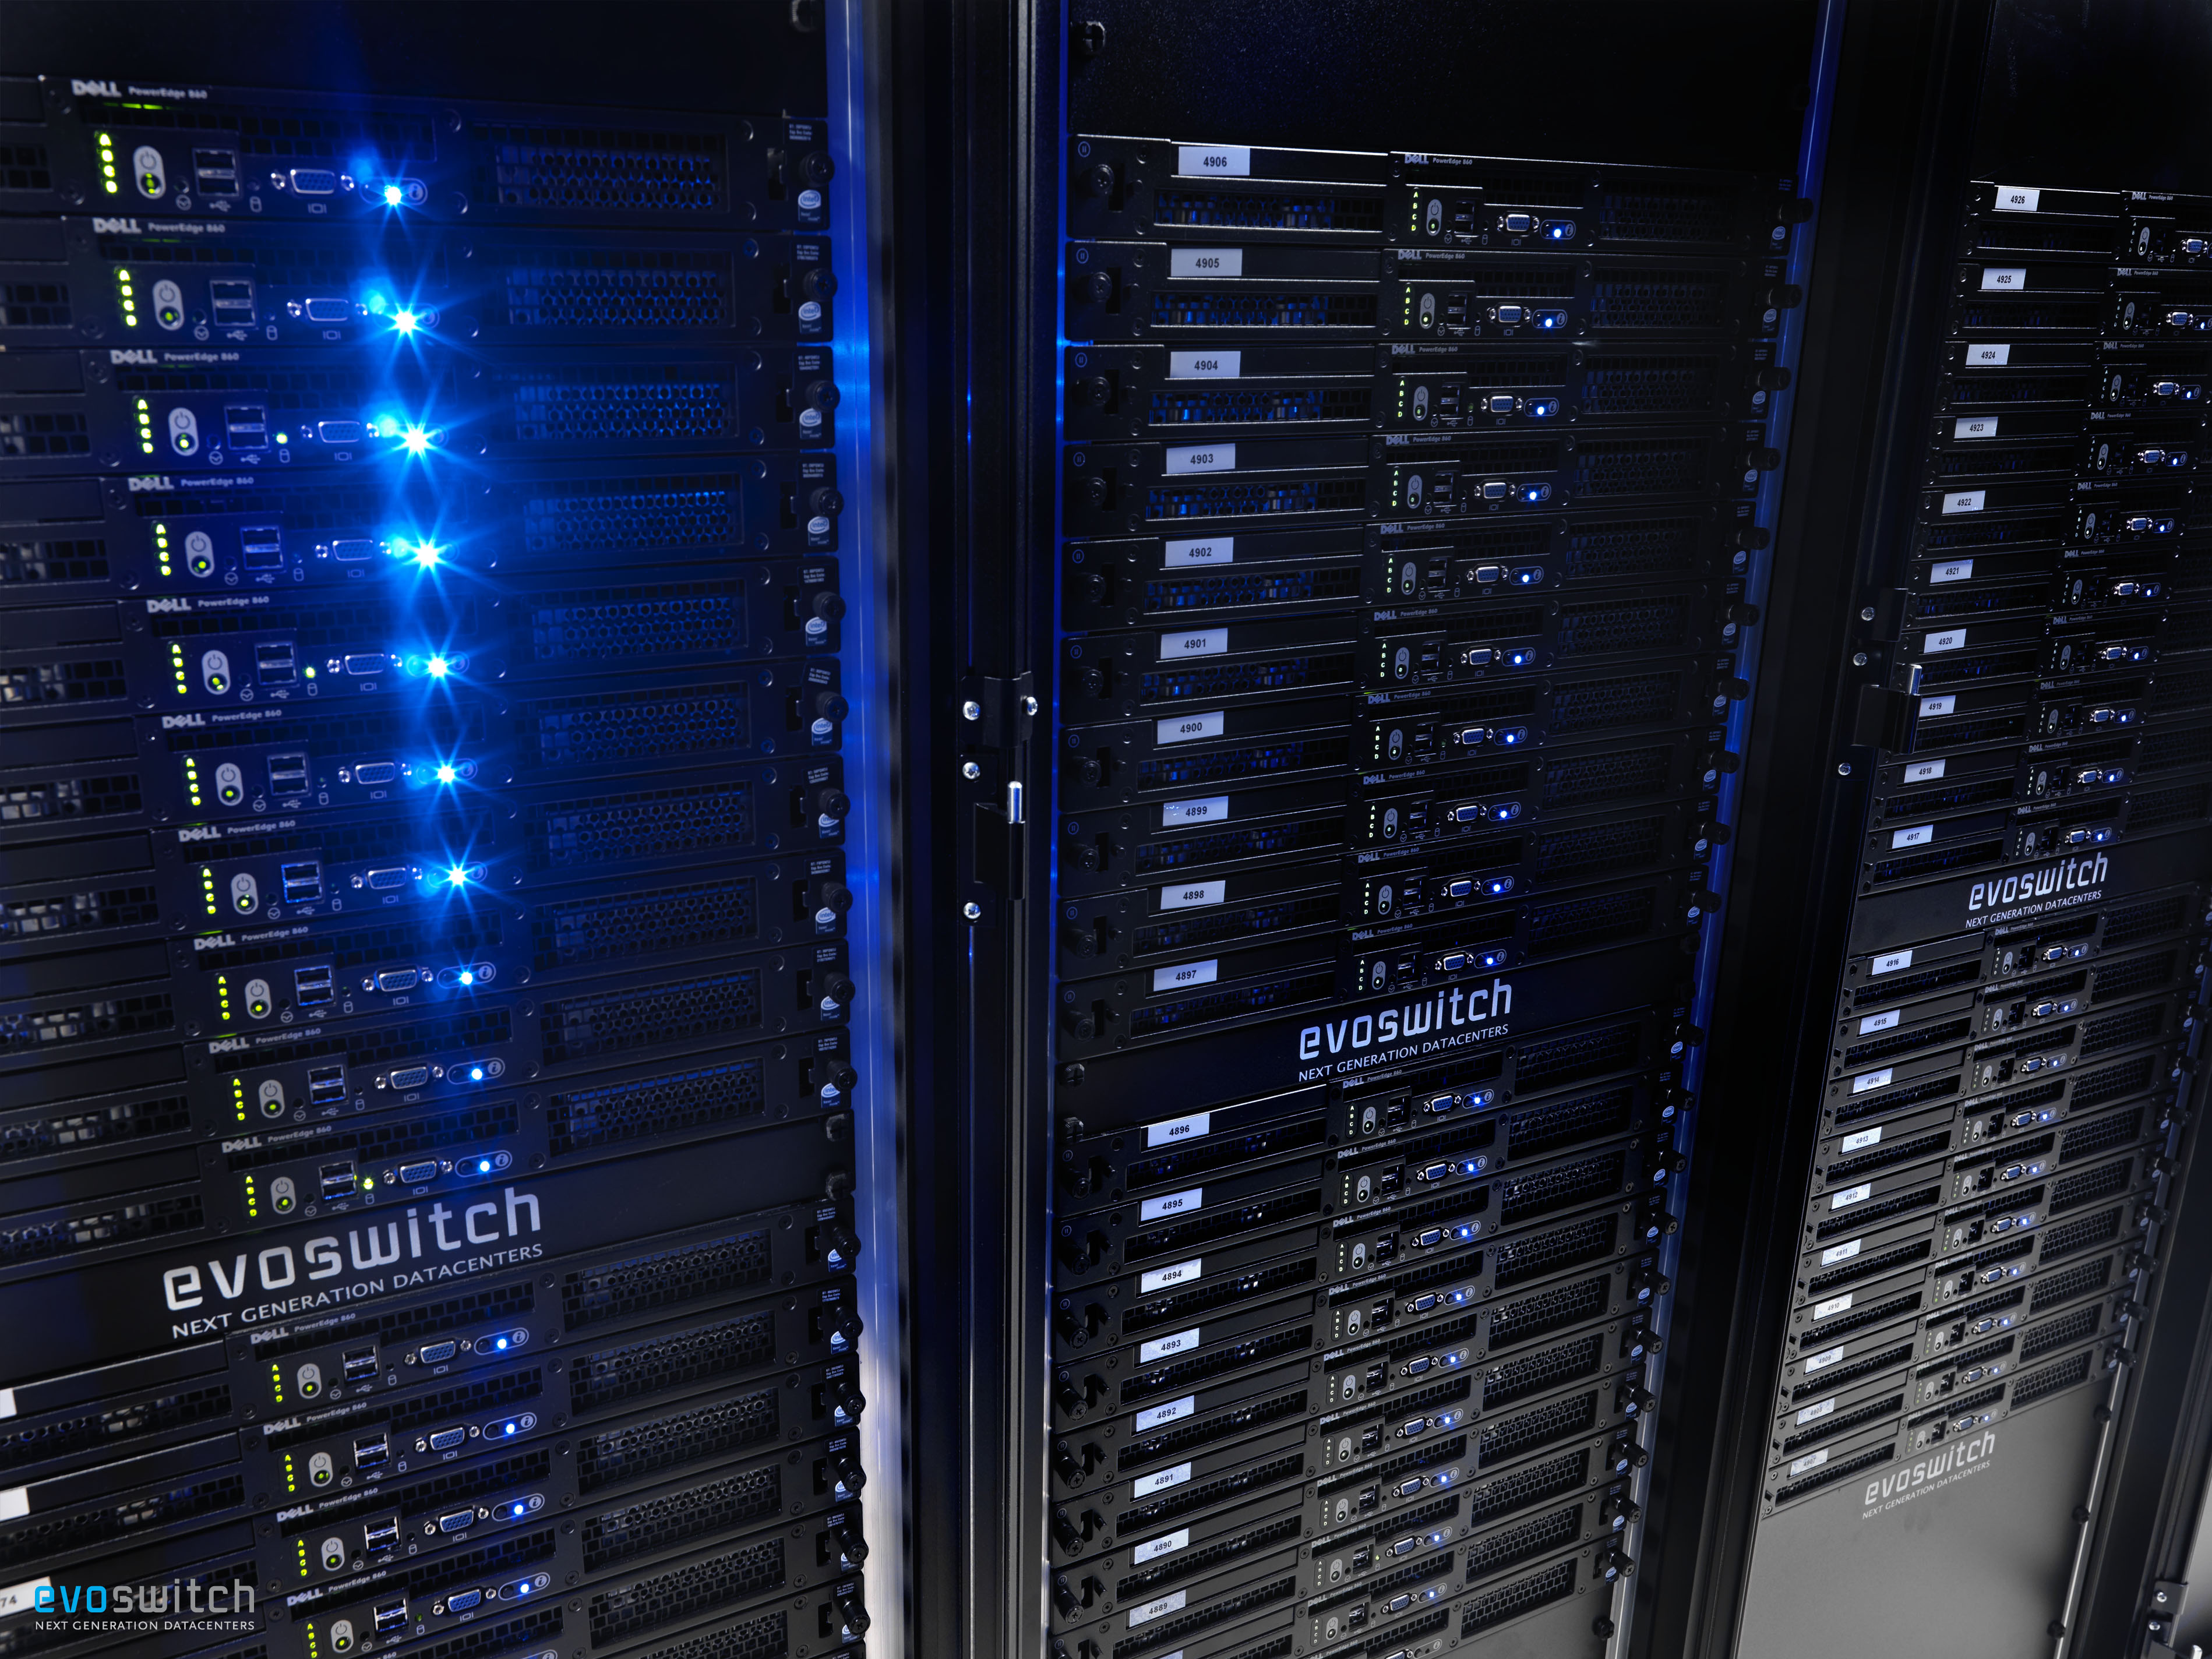 General 3797x2848 server cloud computing data center internet network online Intel Evoswitch technology CPU RAM (Computing) hardware